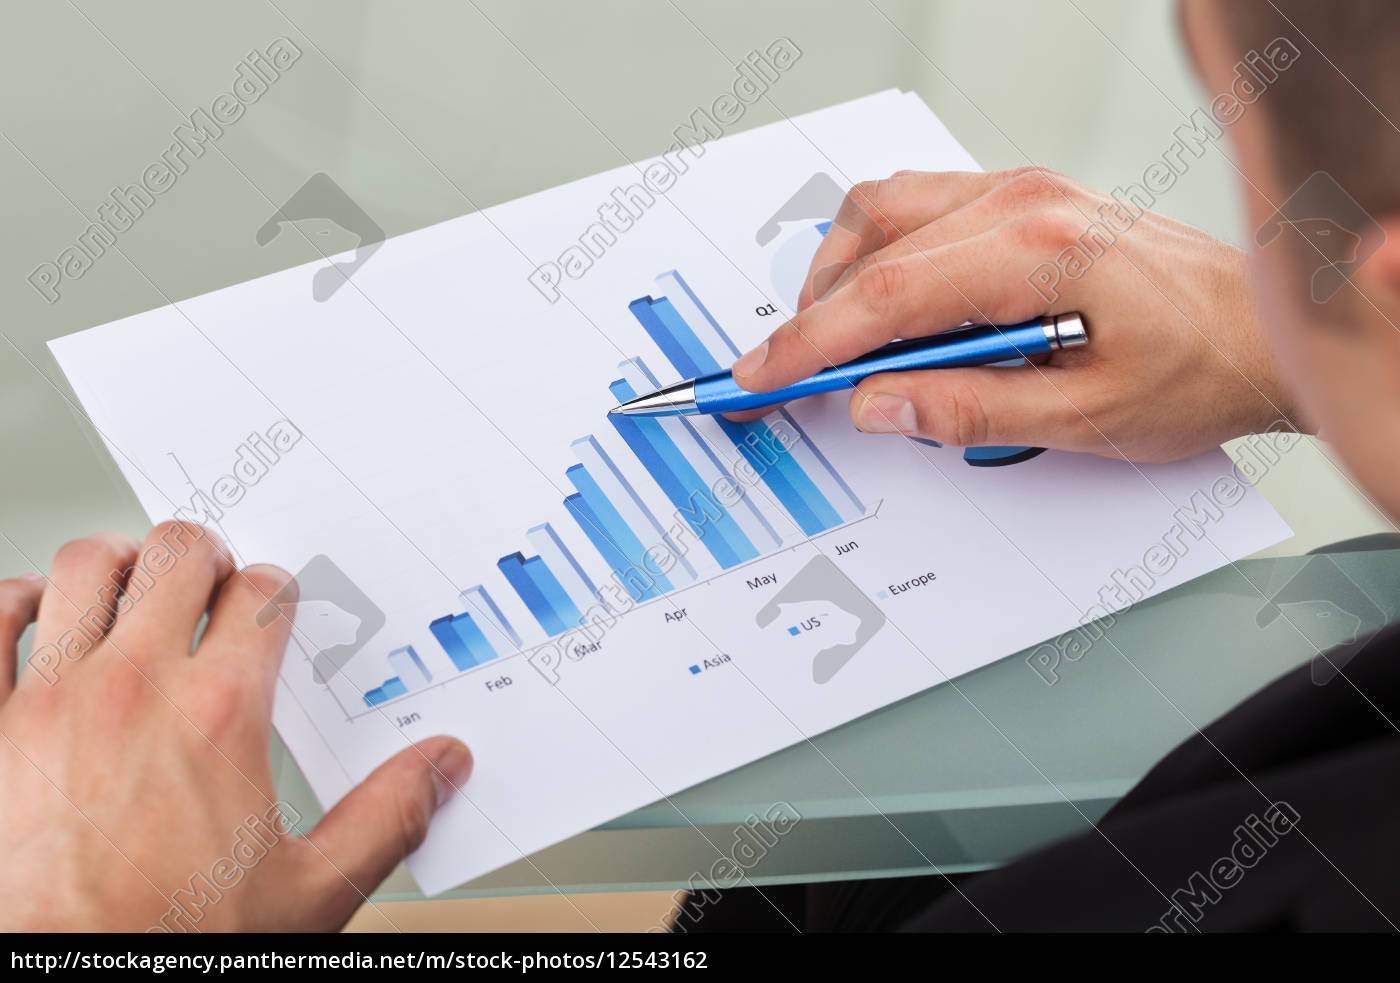 cropped, image, of, businessman, analyzing, bar - 12543162